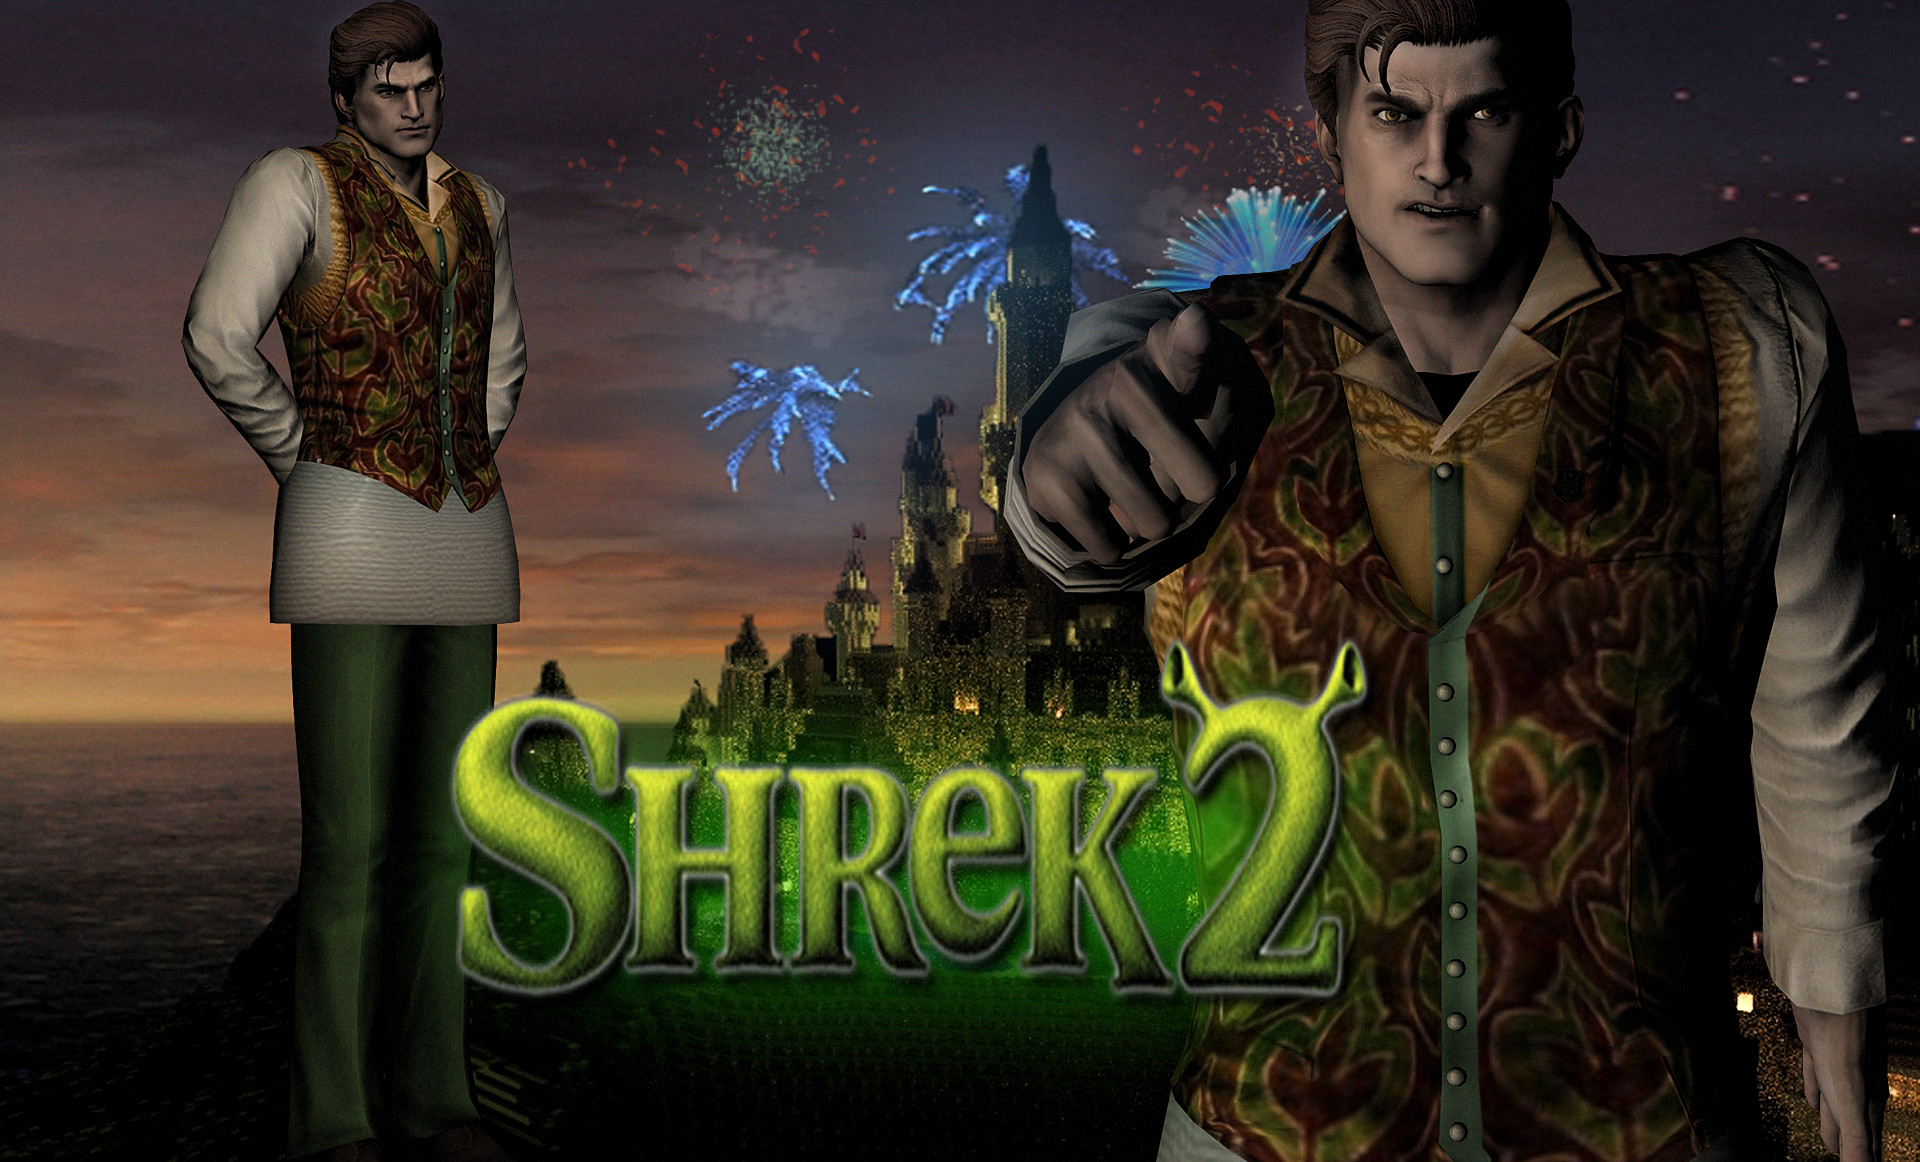 … XPS – Shrek 2 – Human Shrek Download by SovietMentality